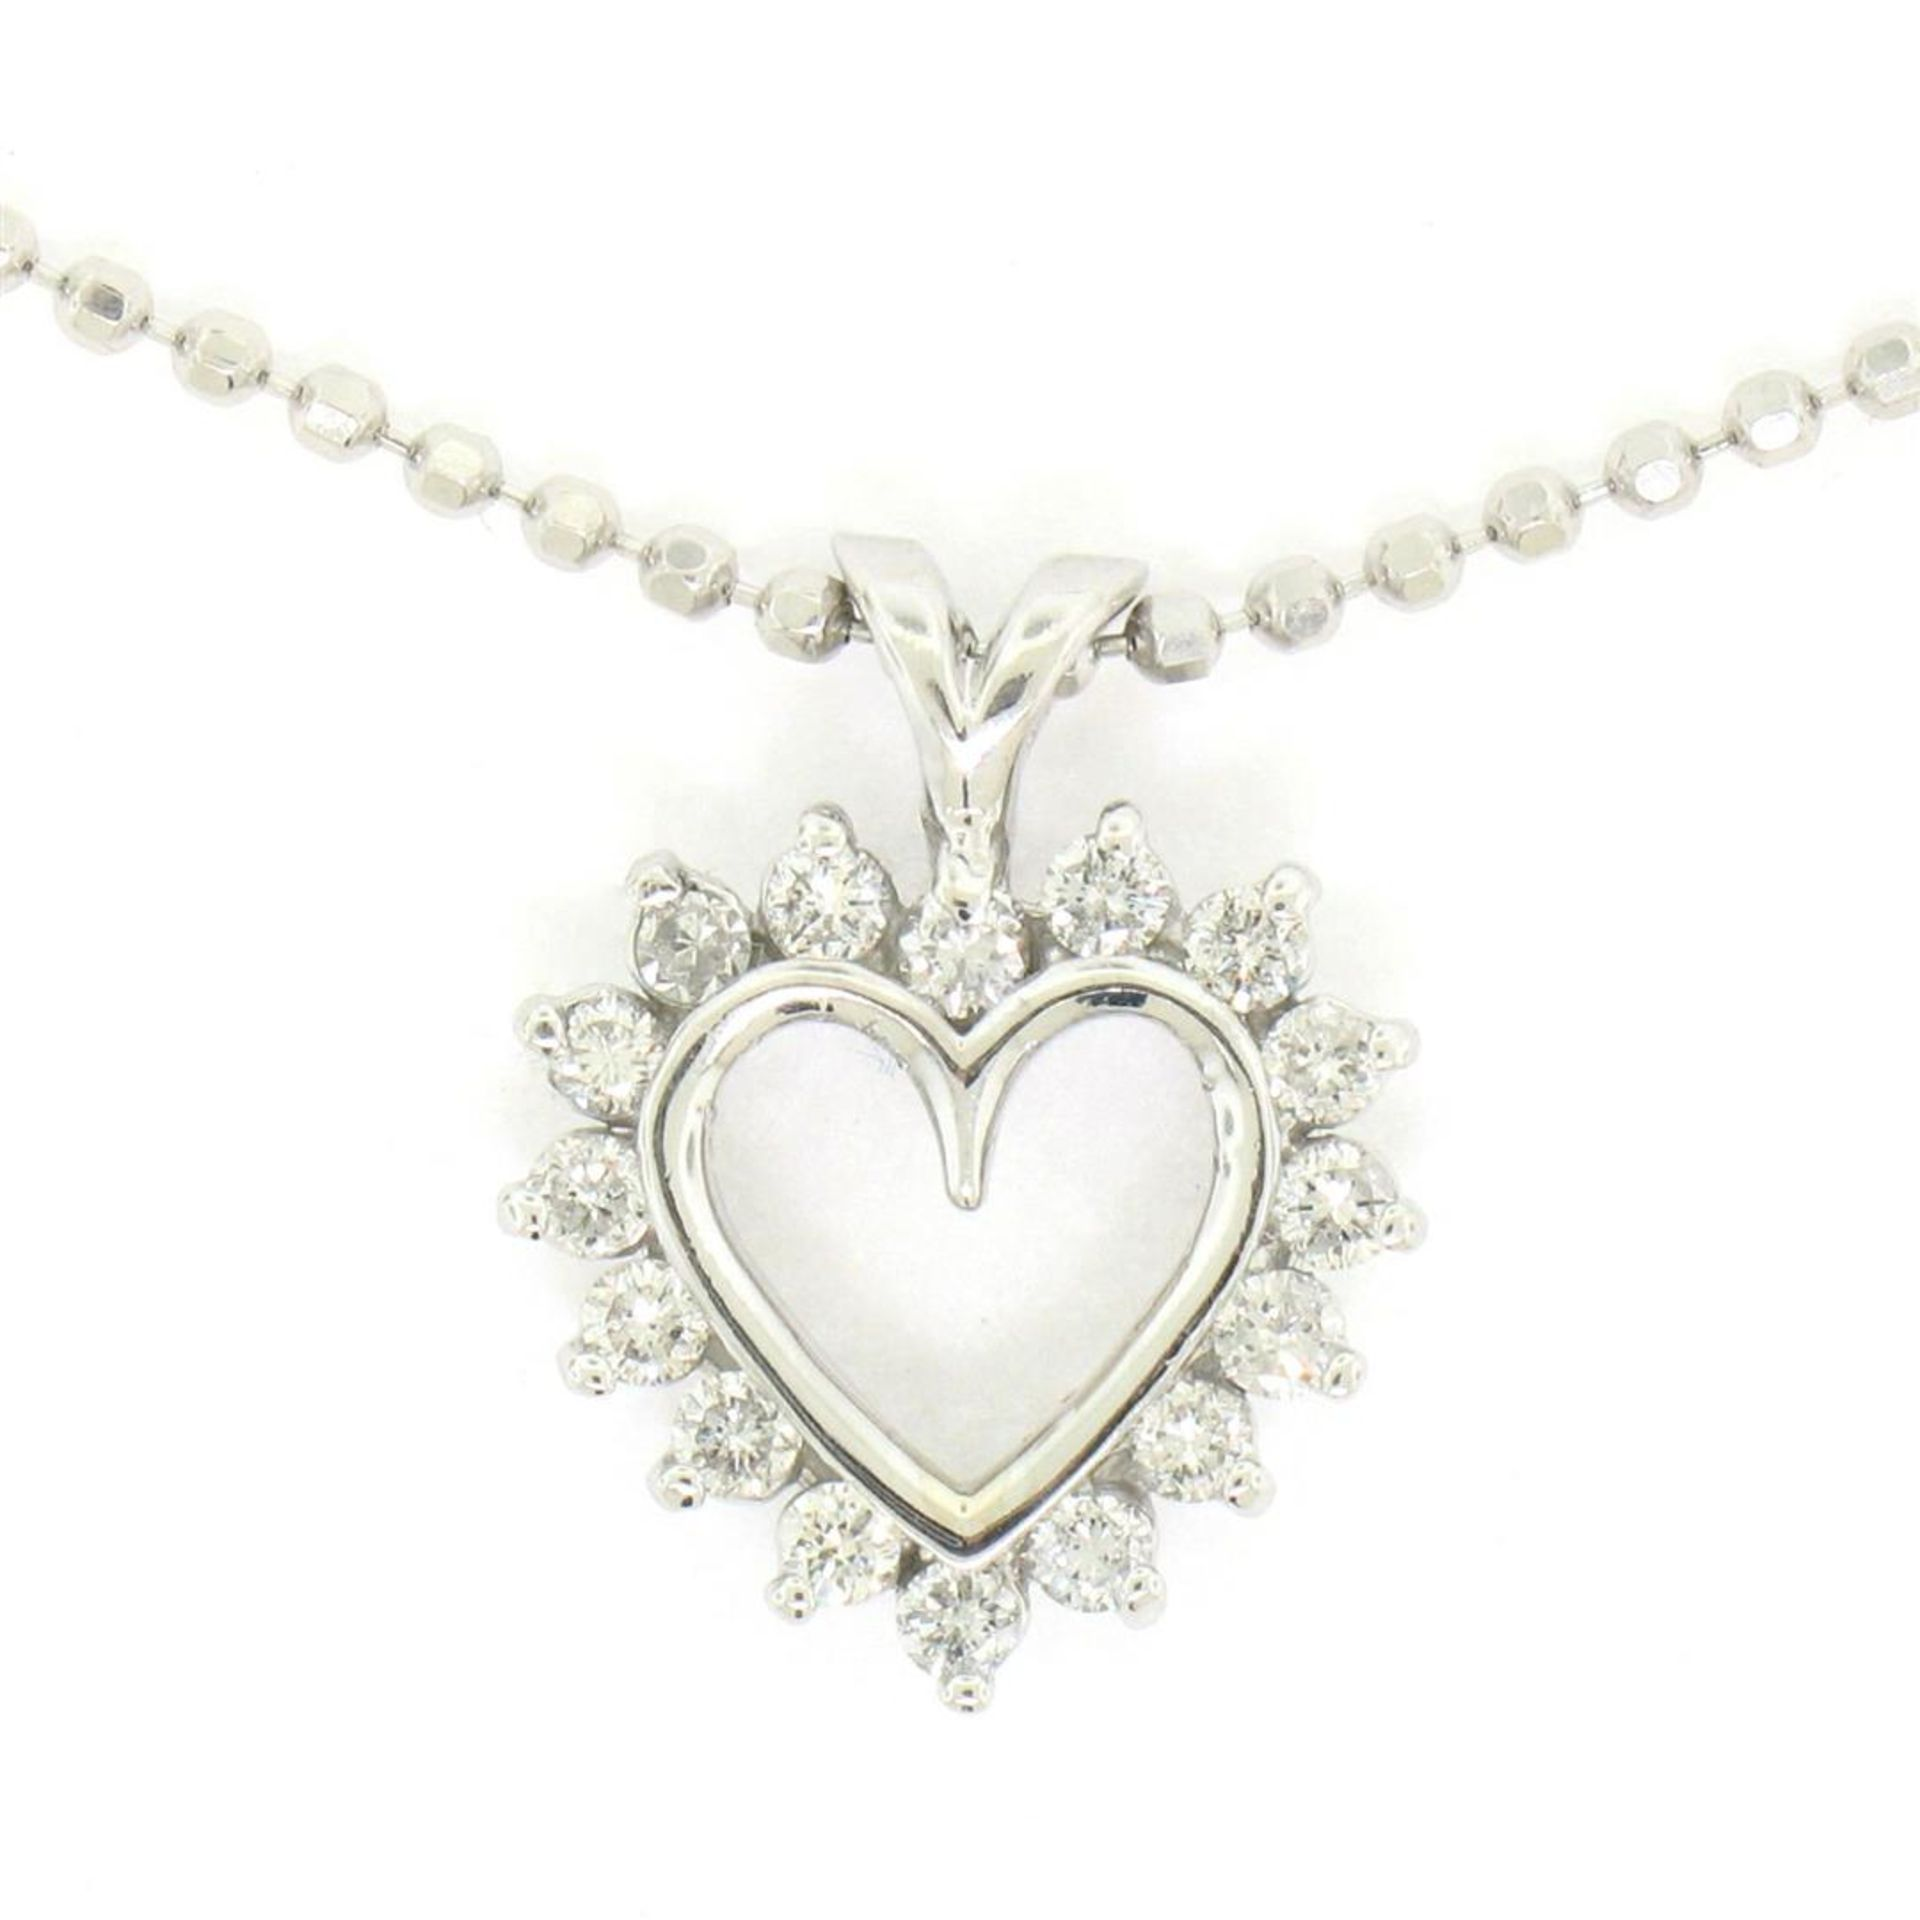 "14k White Gold 0.40 ctw Round Brilliant Diamond Open Heart Pendant 18"" Bead Chai - Image 2 of 7"